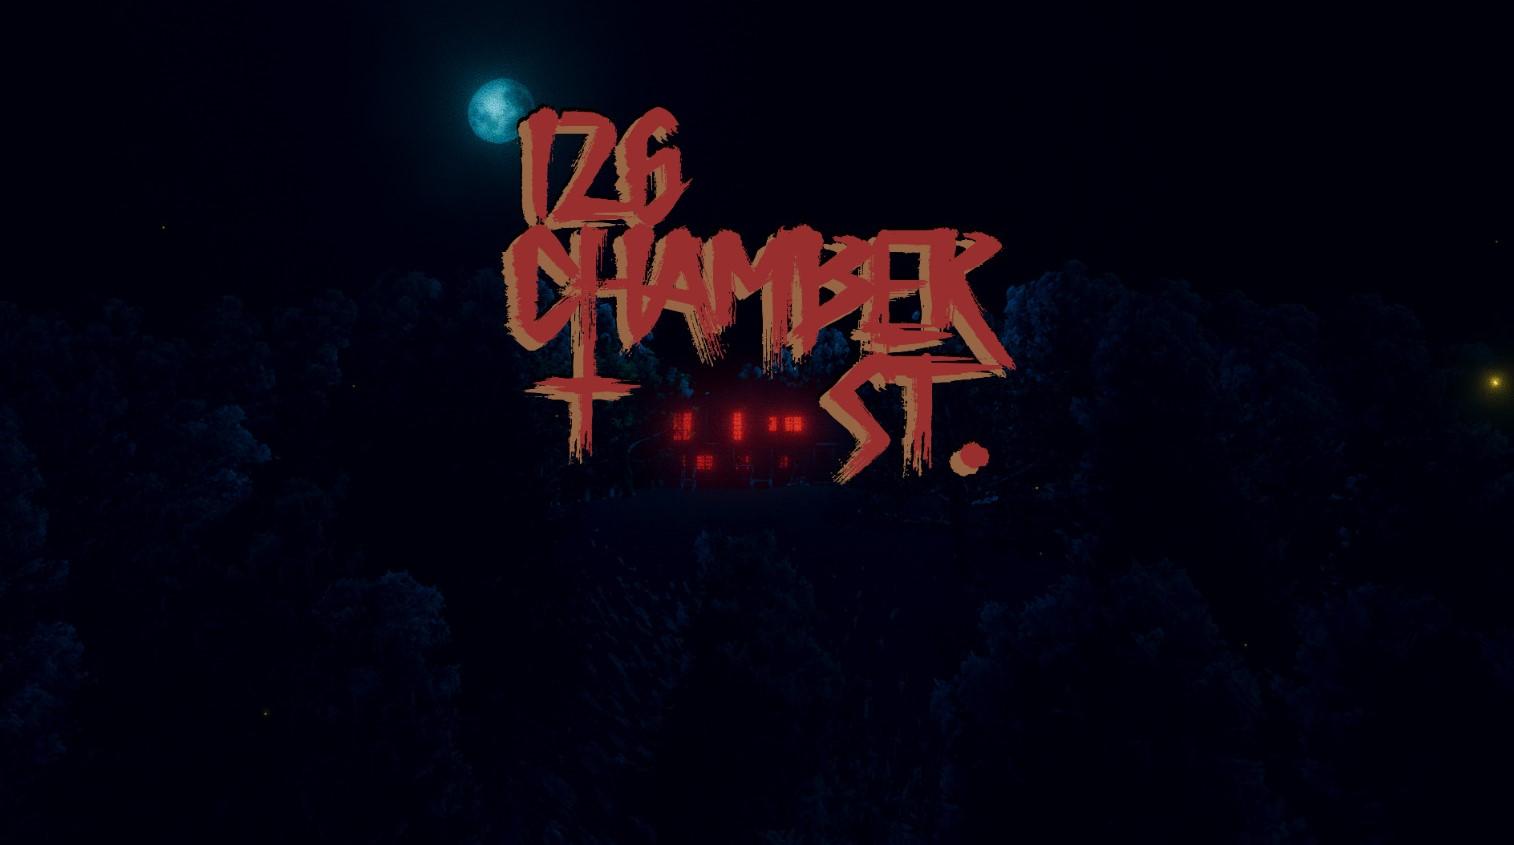 126 Chamber St.